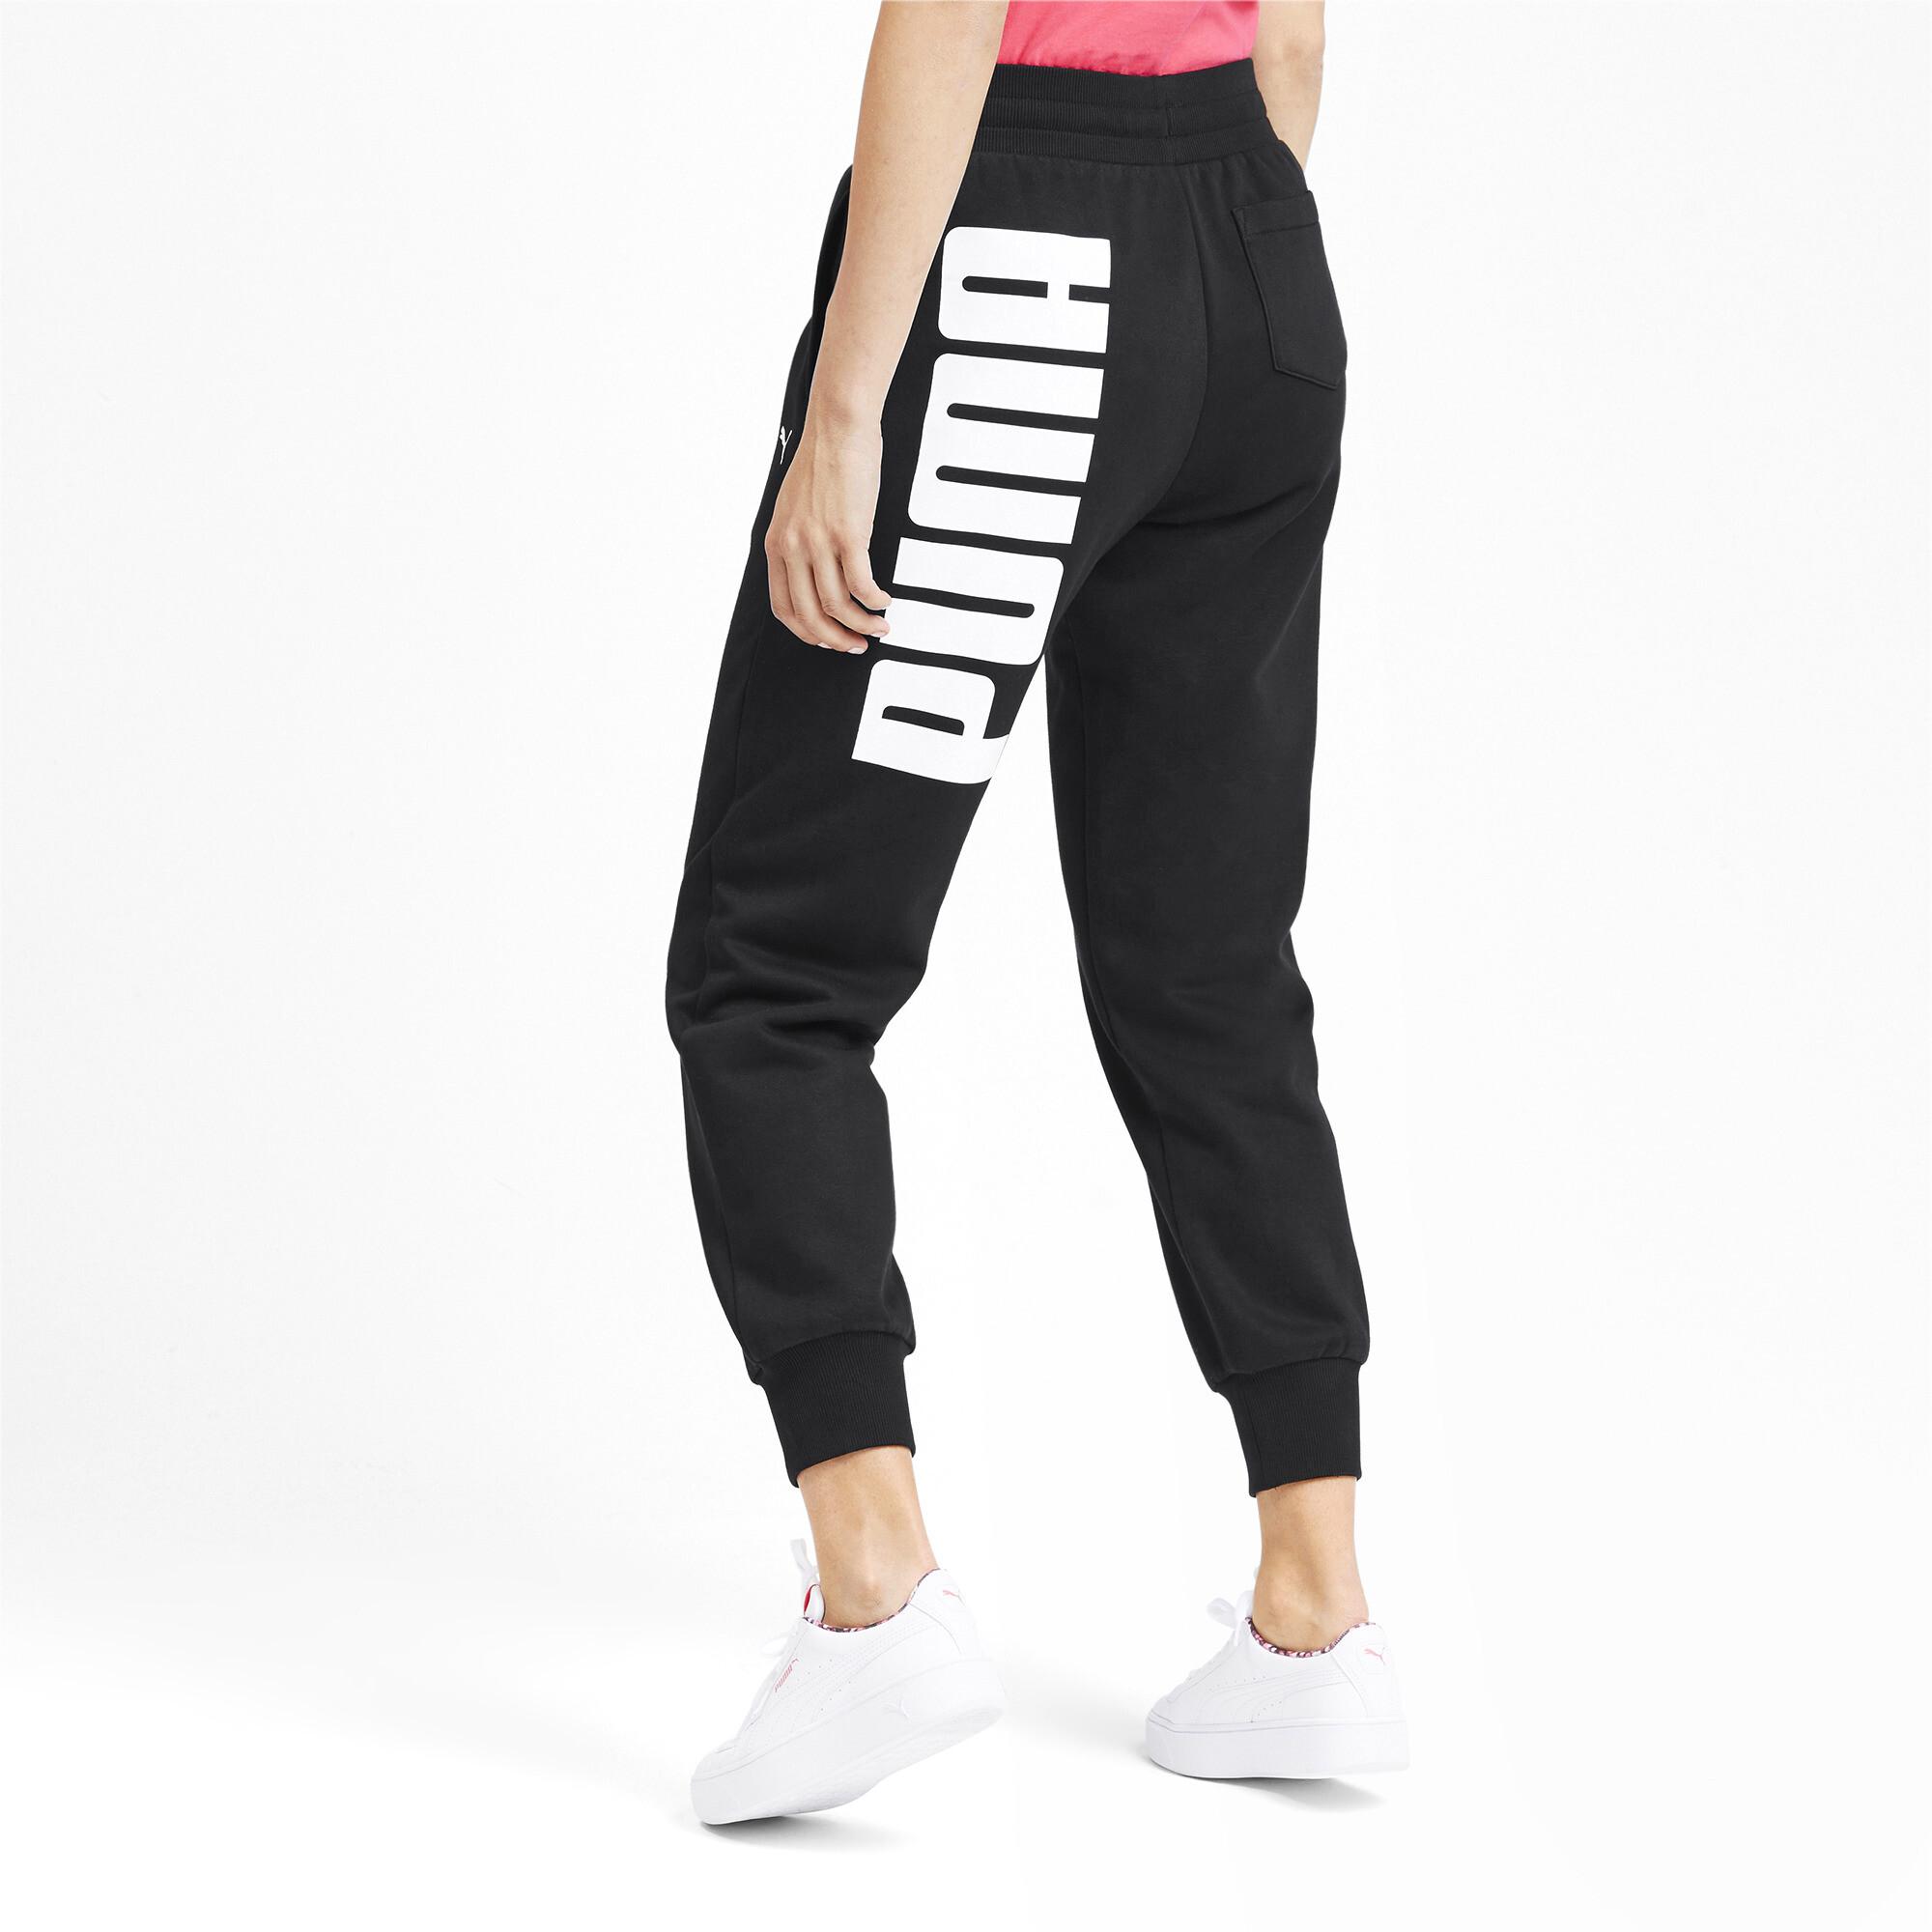 PUMA-Rebel-Women-039-s-Sweatpants-Women-Knitted-Pants-Basics thumbnail 5